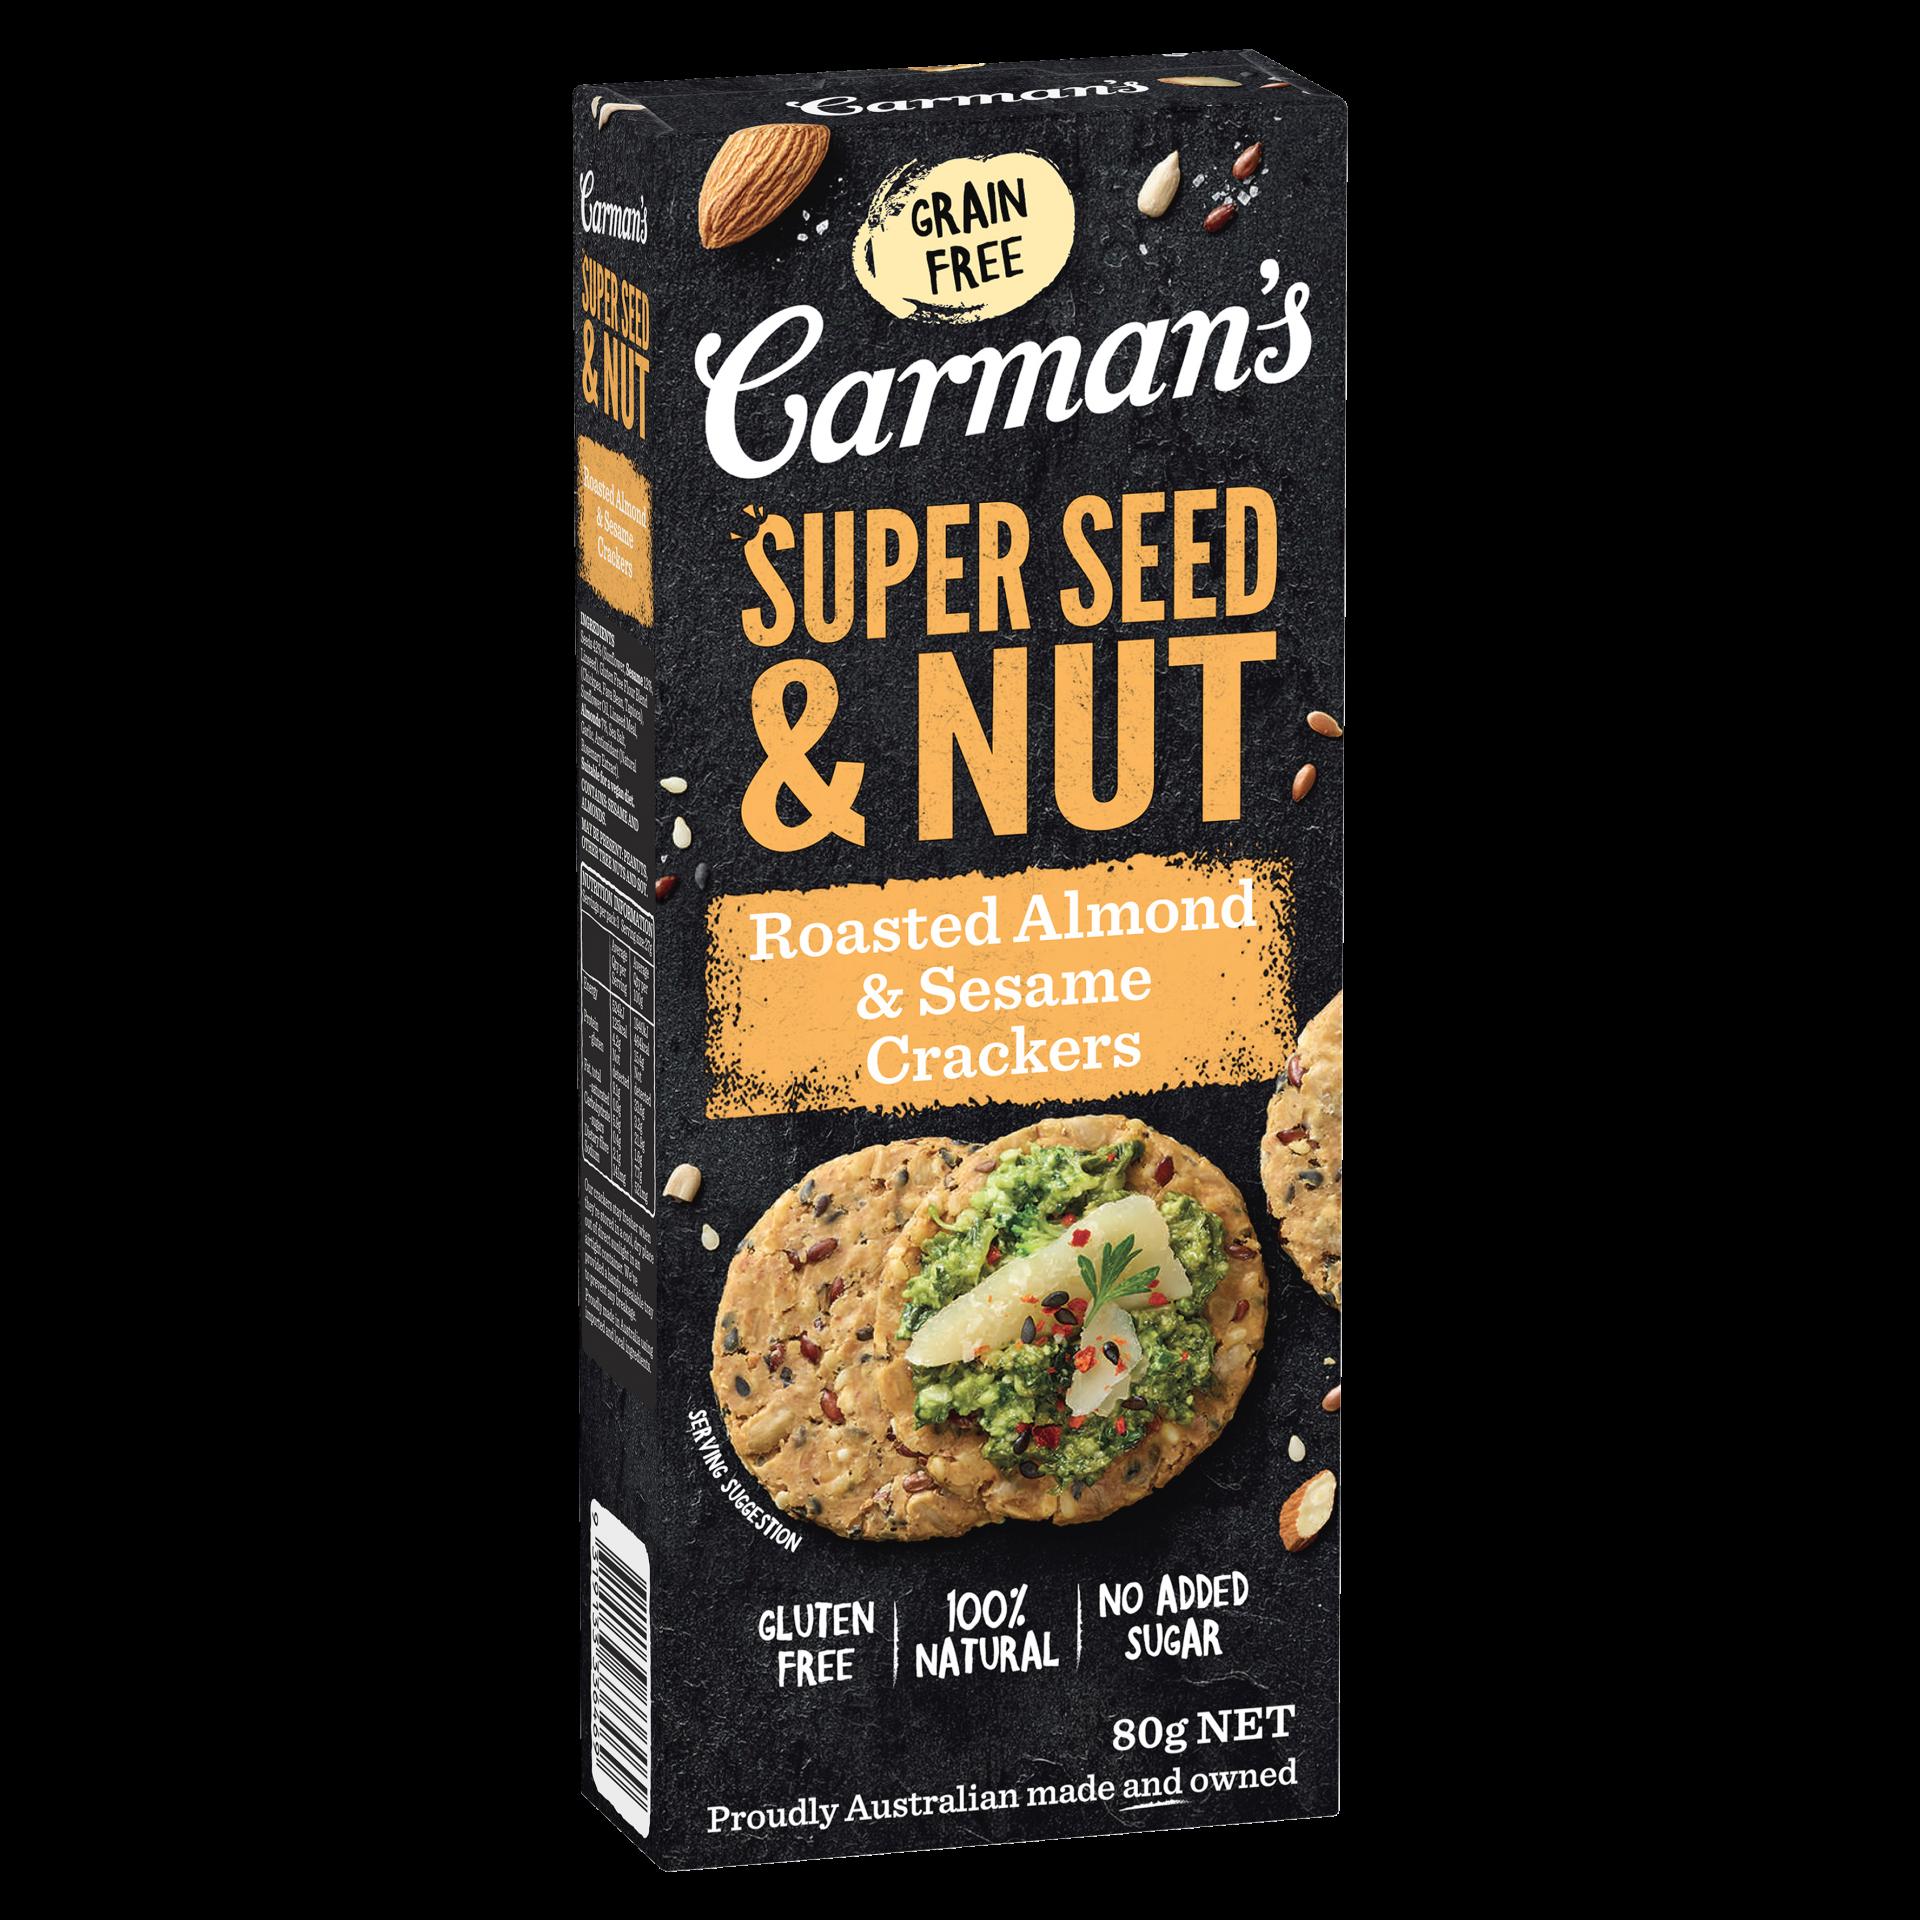 Gluten-Free Roasted Almond & Sesame Super Seed & Nut Crackers